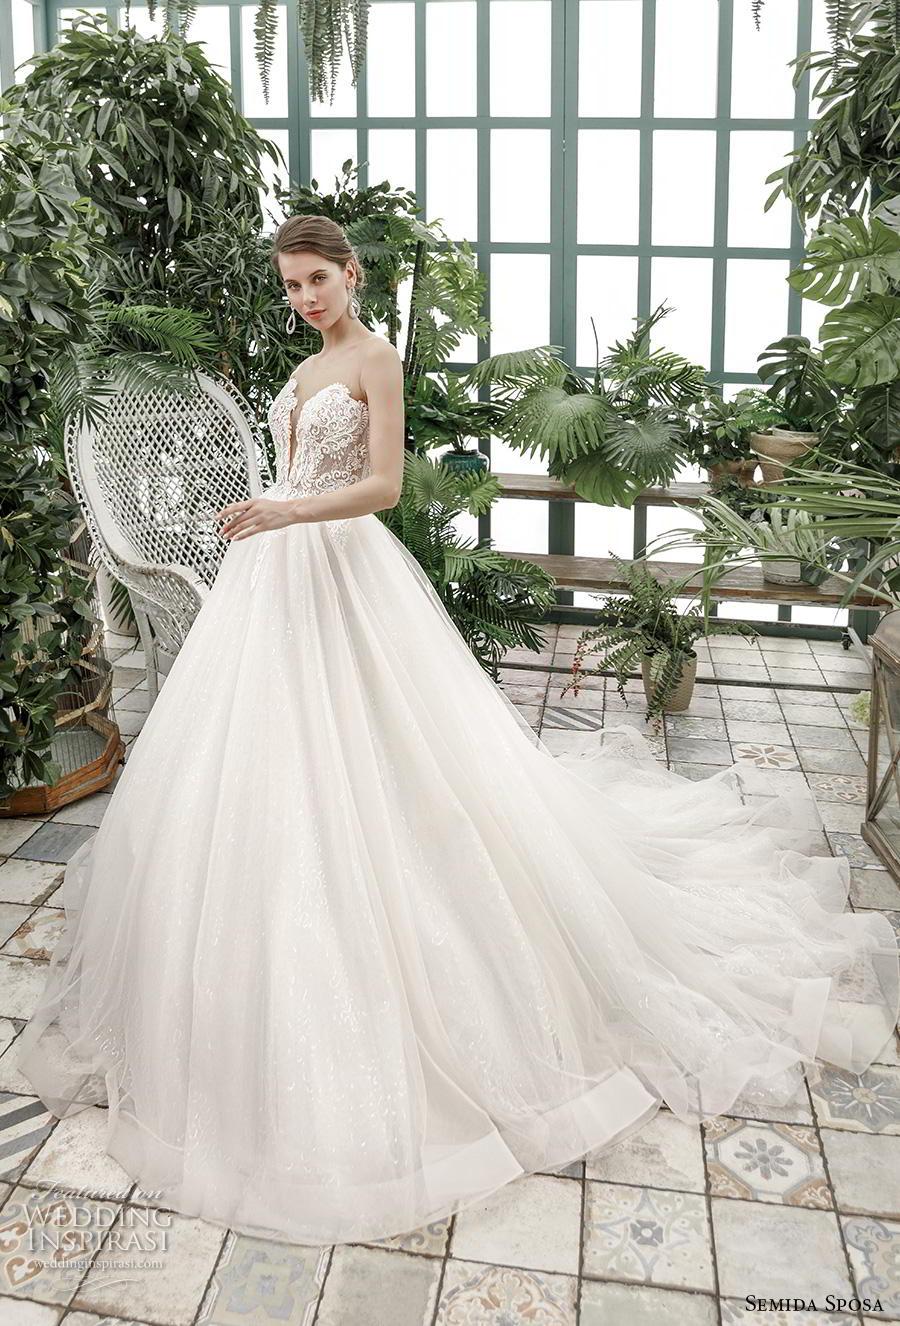 Semida Sposa 2020 Wedding Dresses